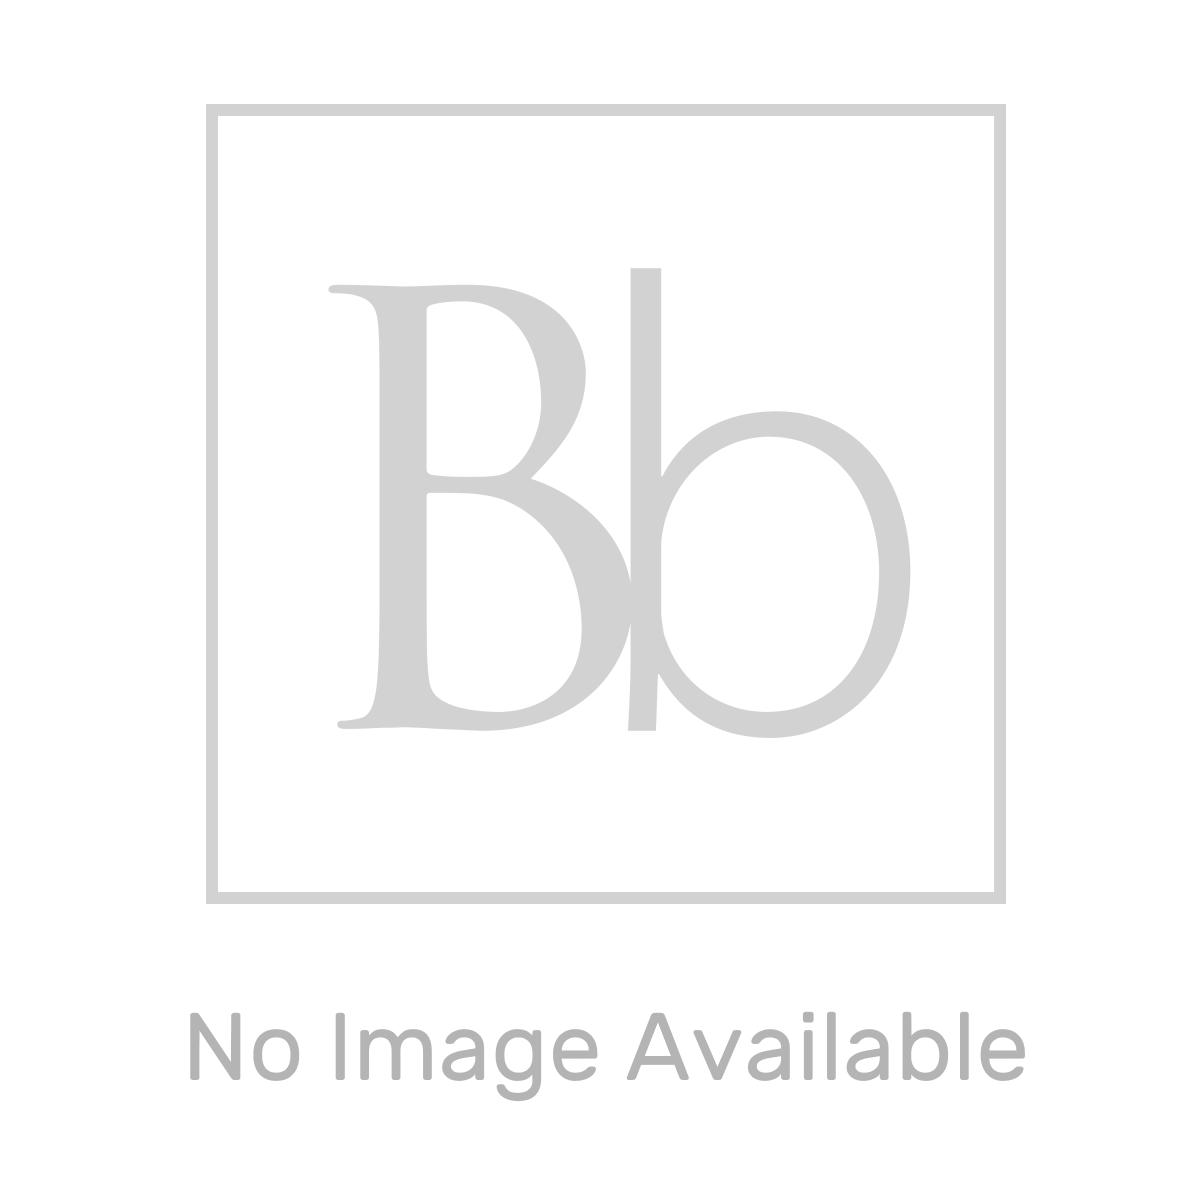 Vitra Neon Shower Bath 1700 x 750mm Right Hand